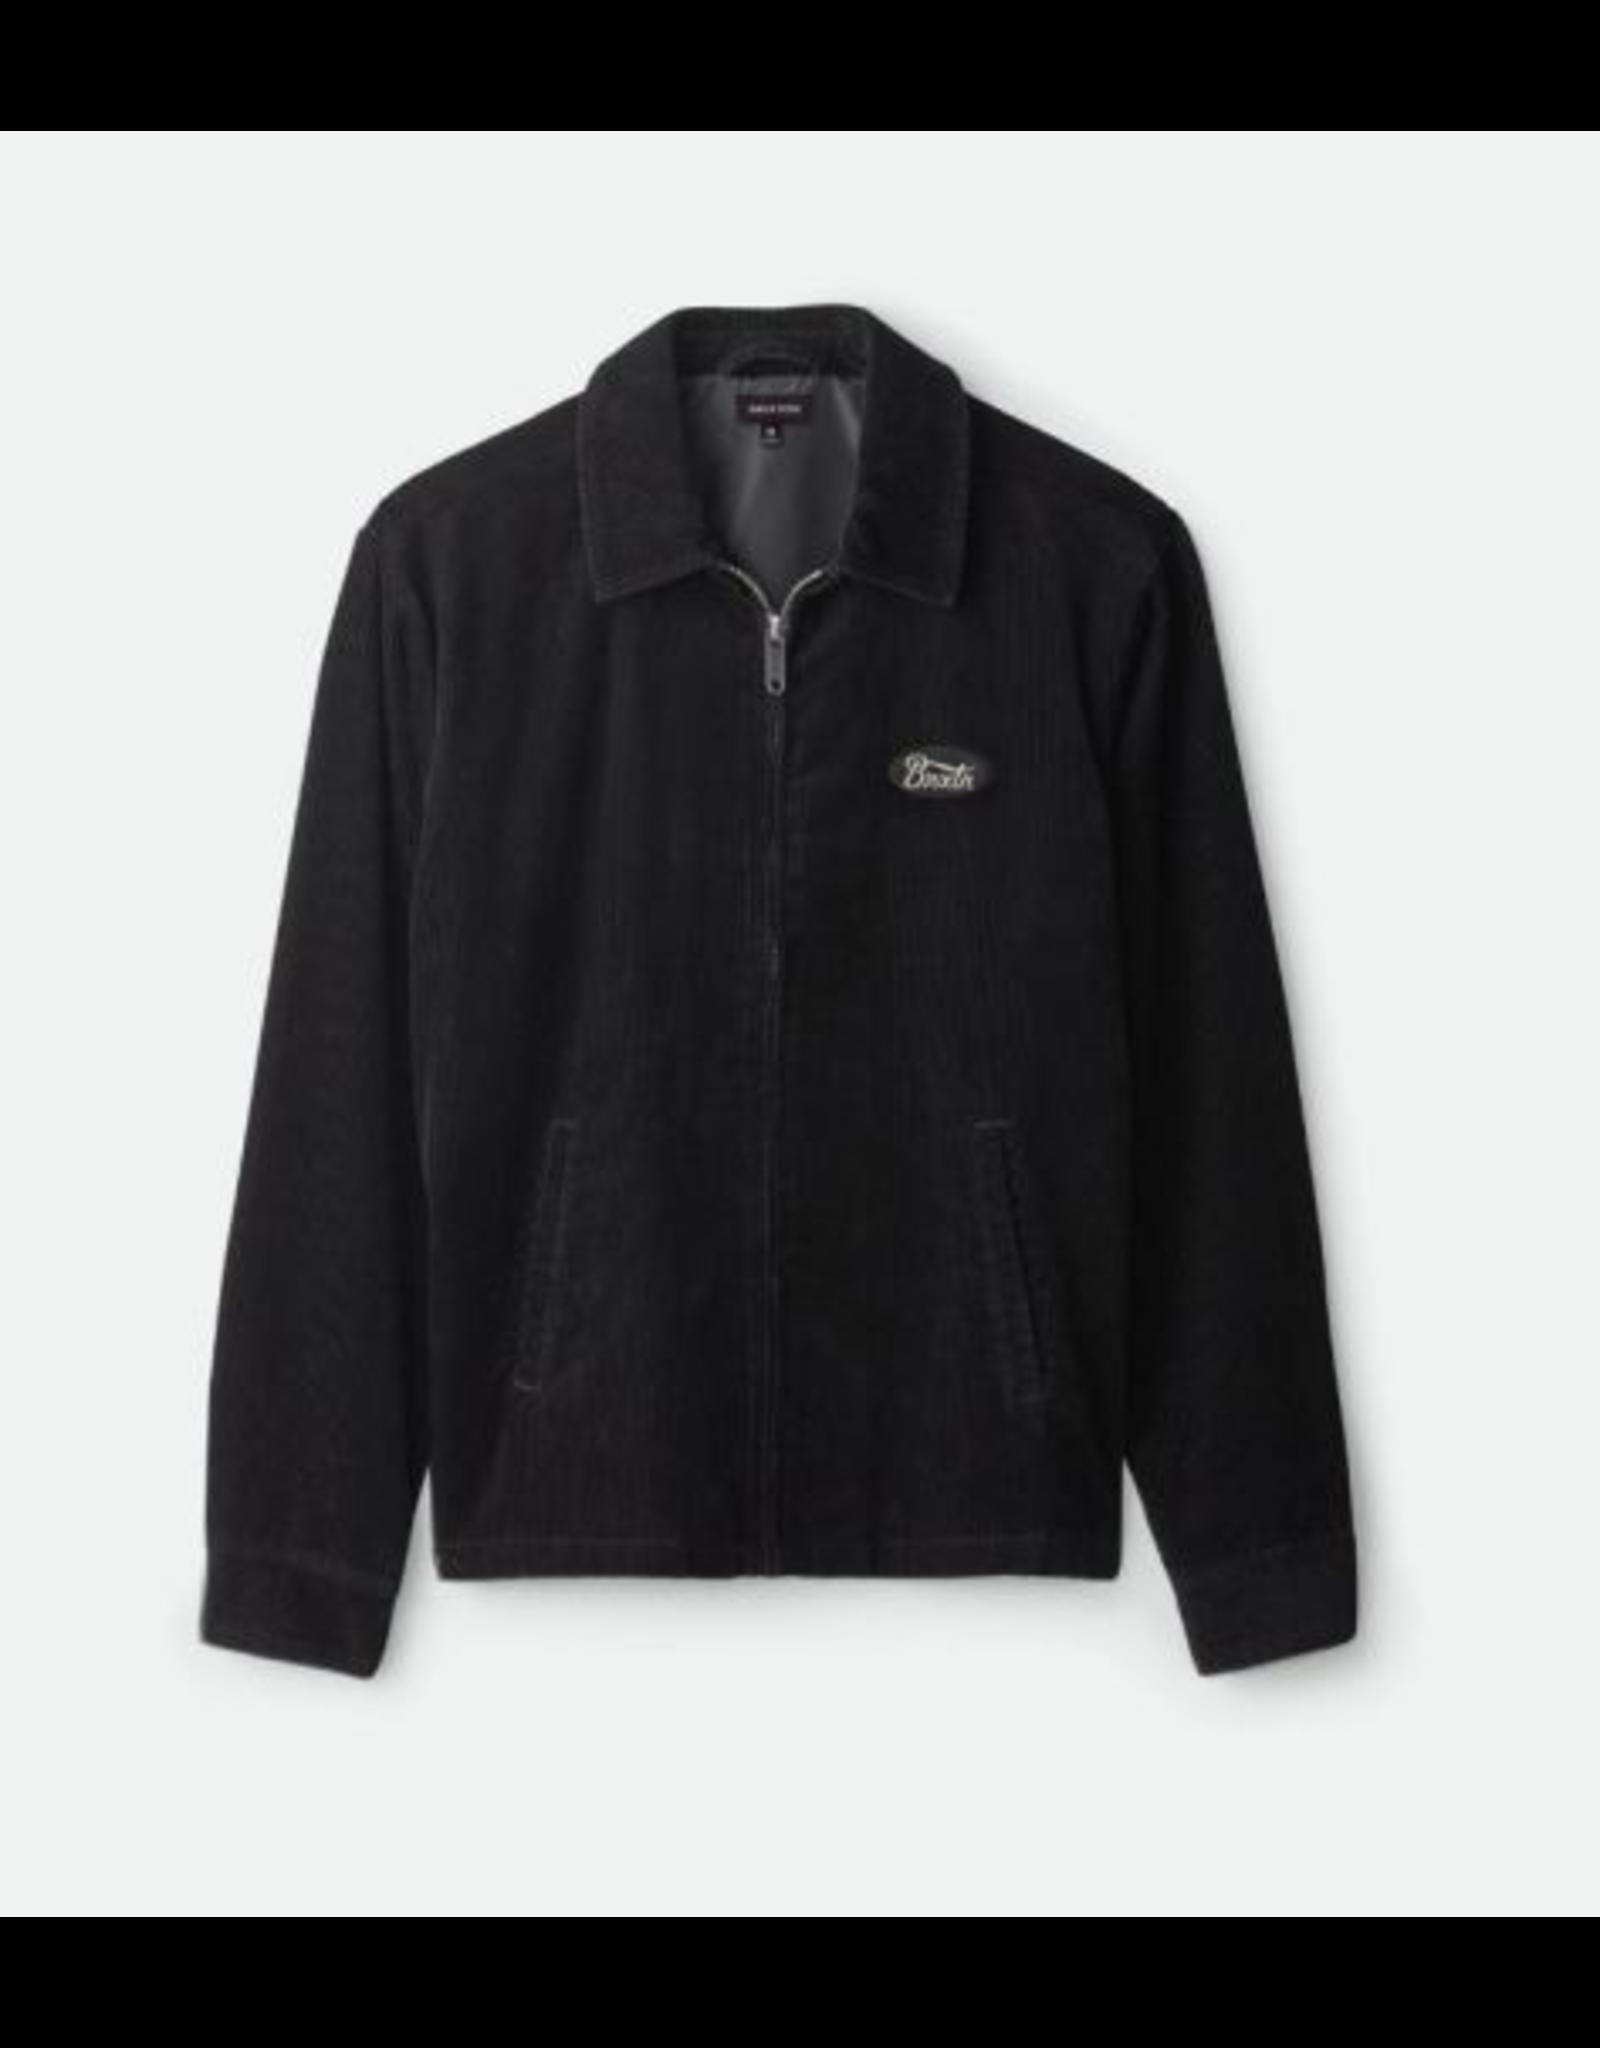 Brixton Utopia Men's Jacket - Black